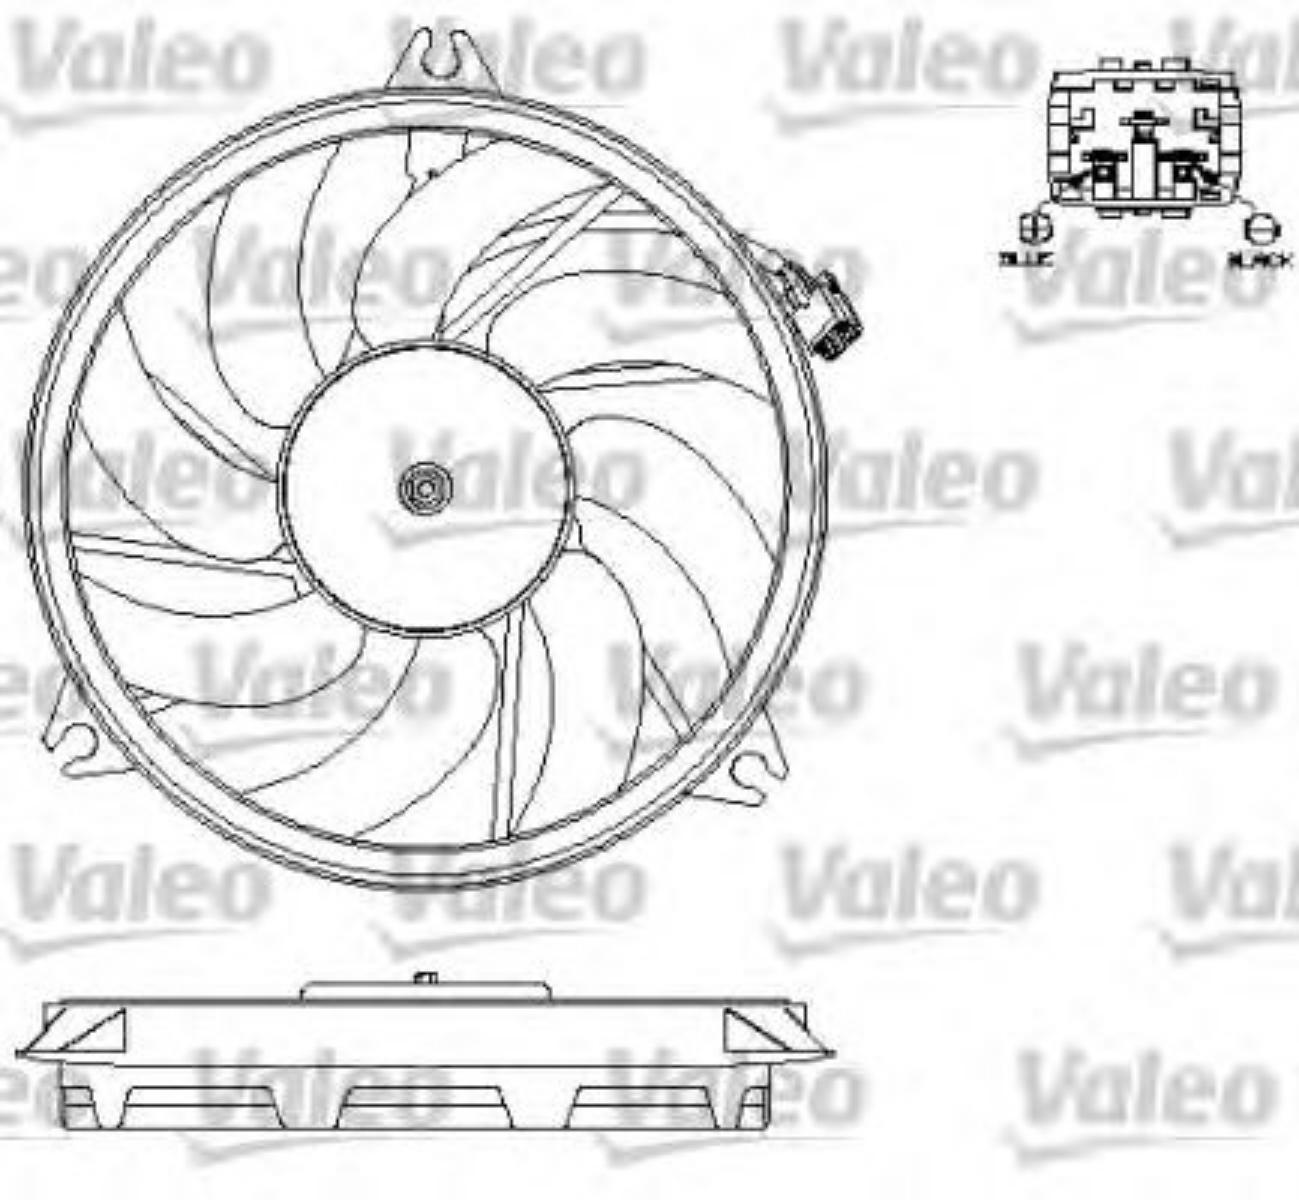 Valeo Radiator Fan Peugeot 206 1 4 Hdi Eco 70 1 1